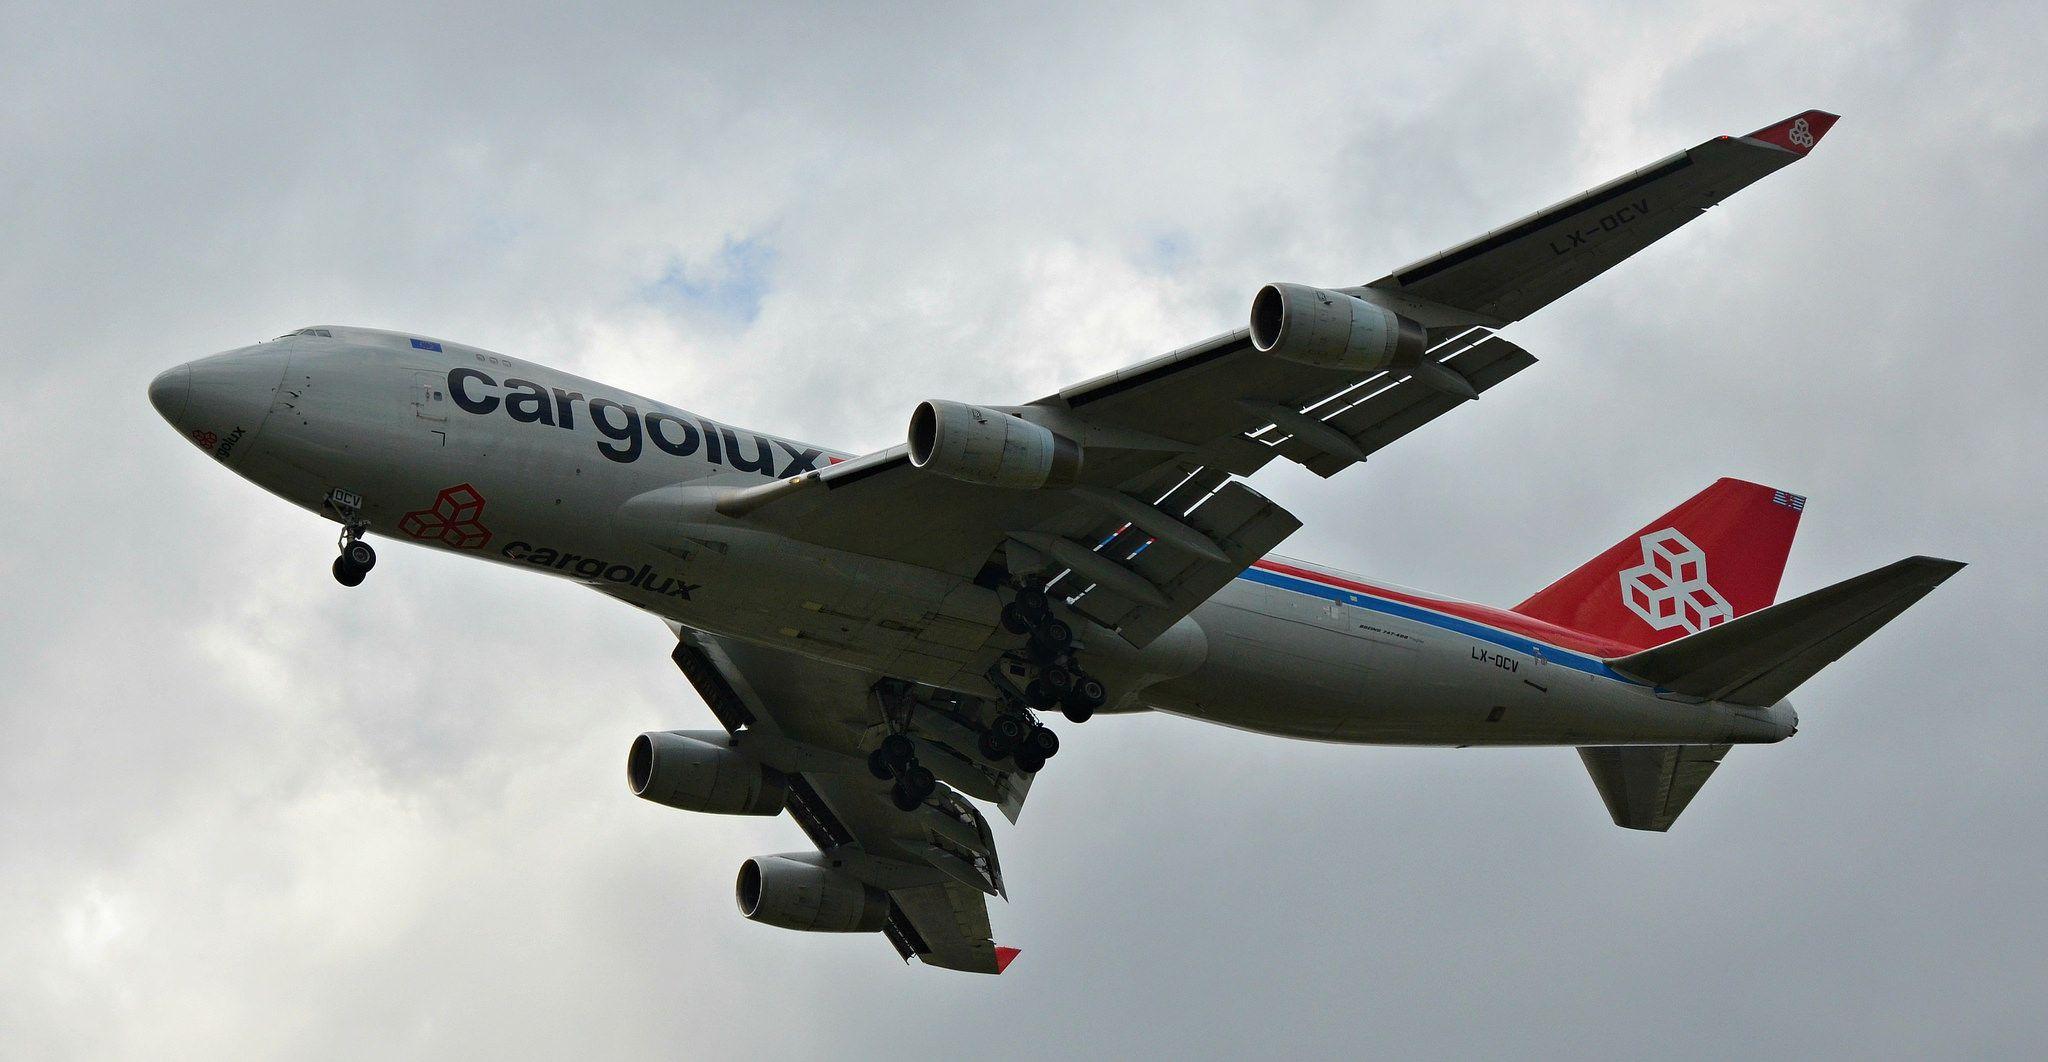 LXOCV Cargolux Airlines International Boeing 747